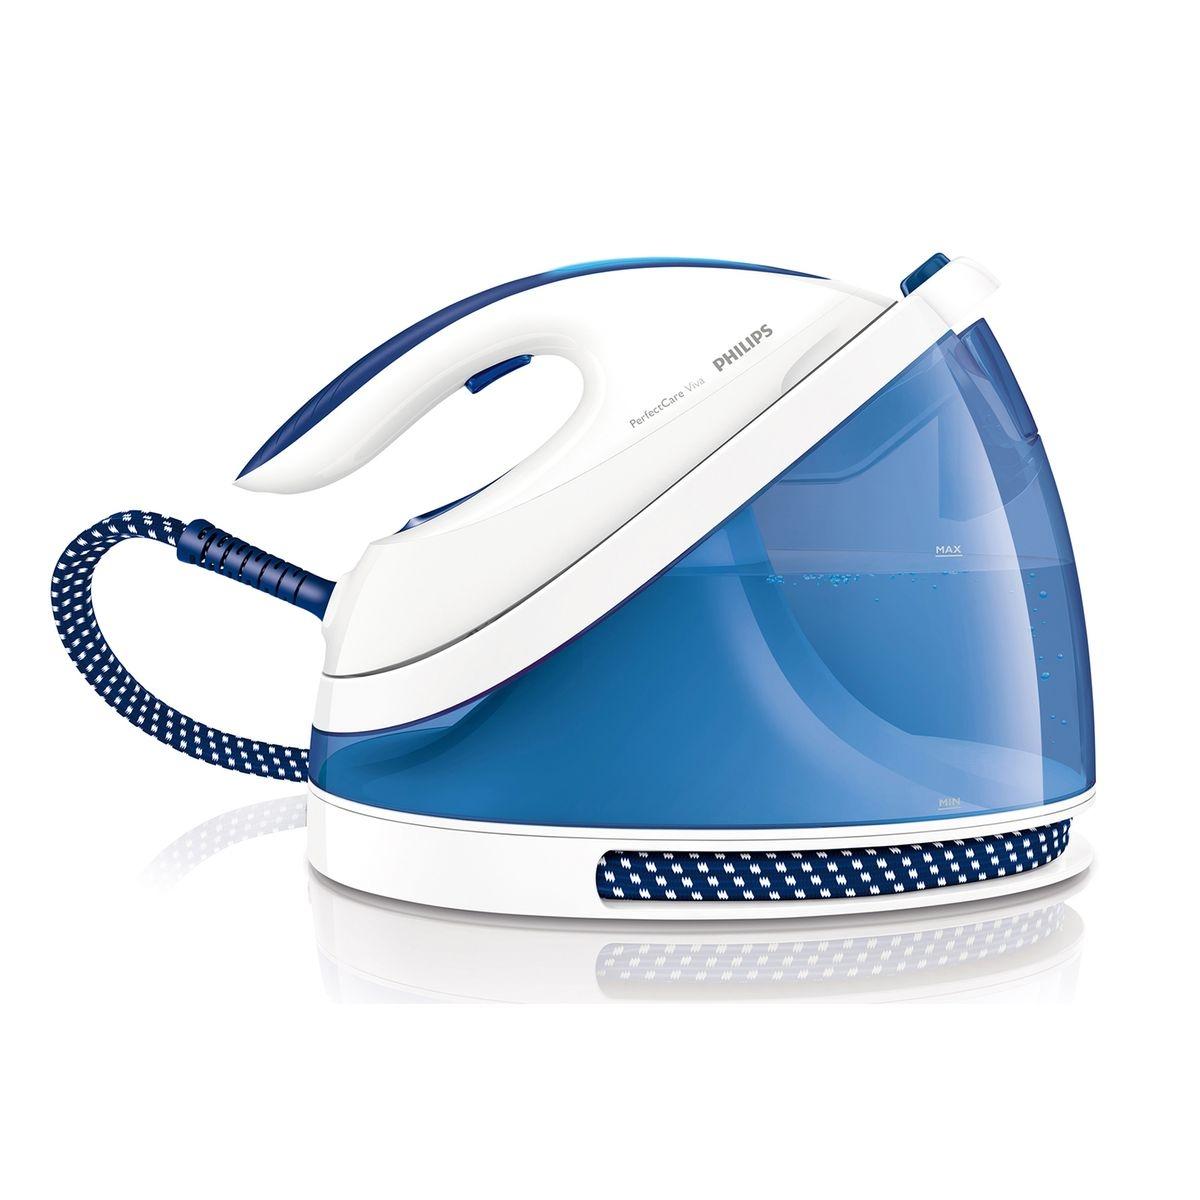 Philips gc9545 02 perfectcare silence vendu par cdiscount 399856 - Centrale vapeur philips gc9650 80 perfectcare elite silence ...